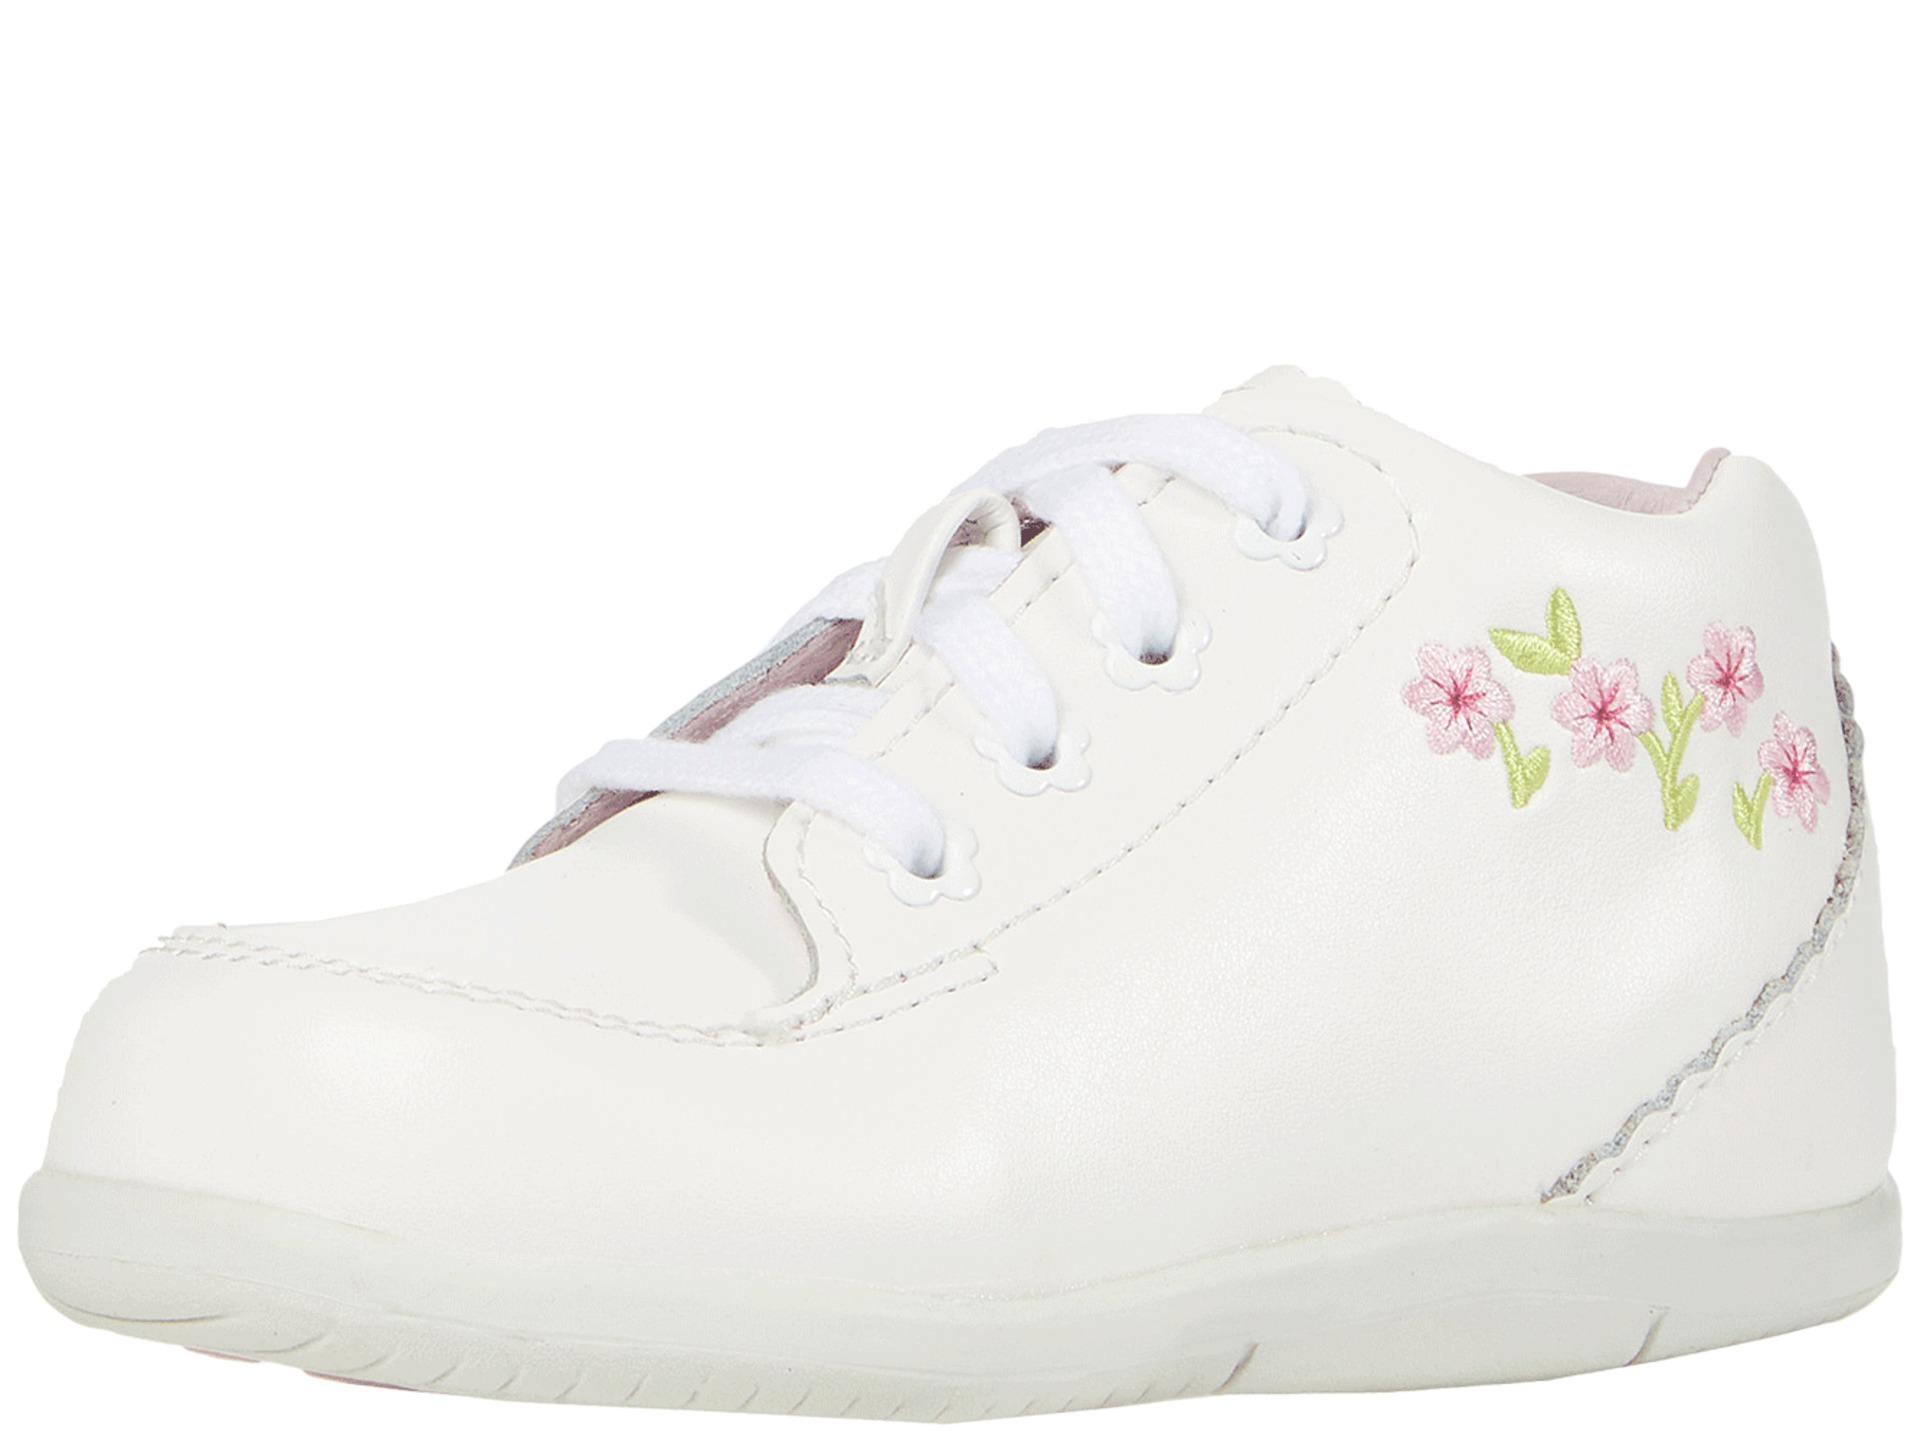 Stride Rite White Girl Shoes